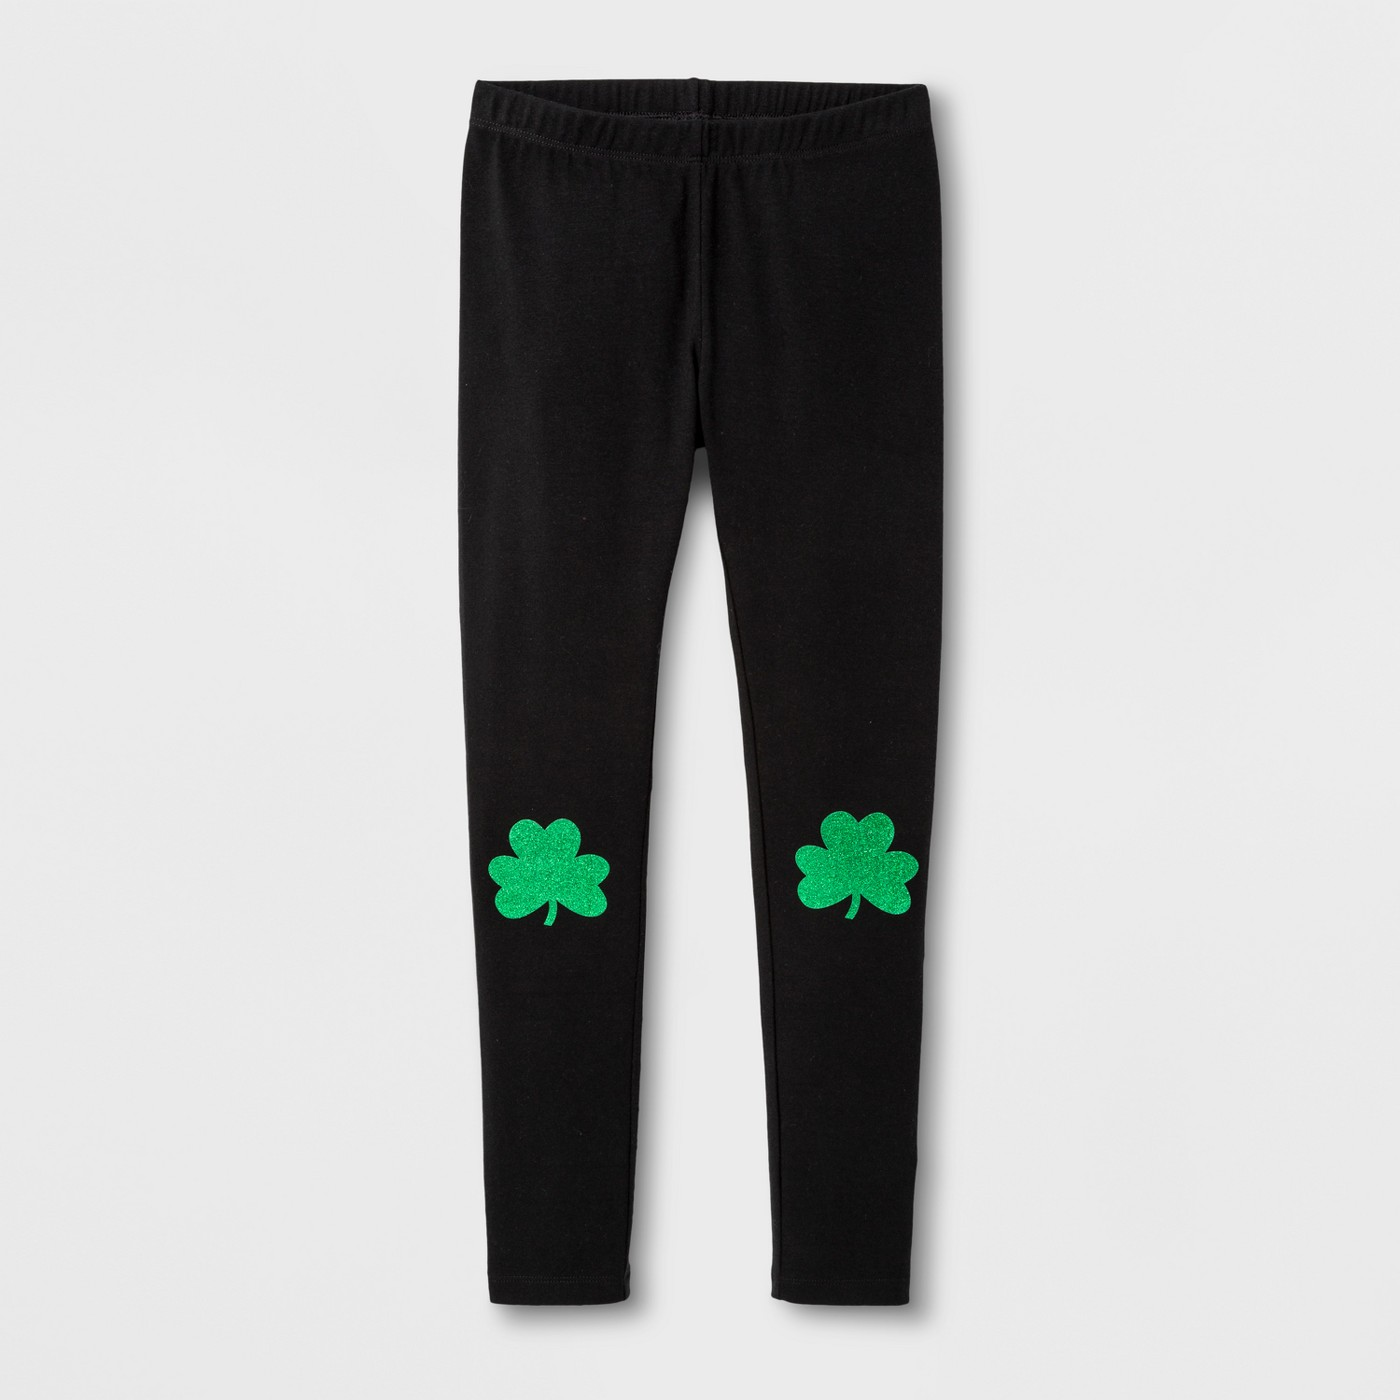 Target Girls 4-Leaf Clover Leggings, $8-.jpeg